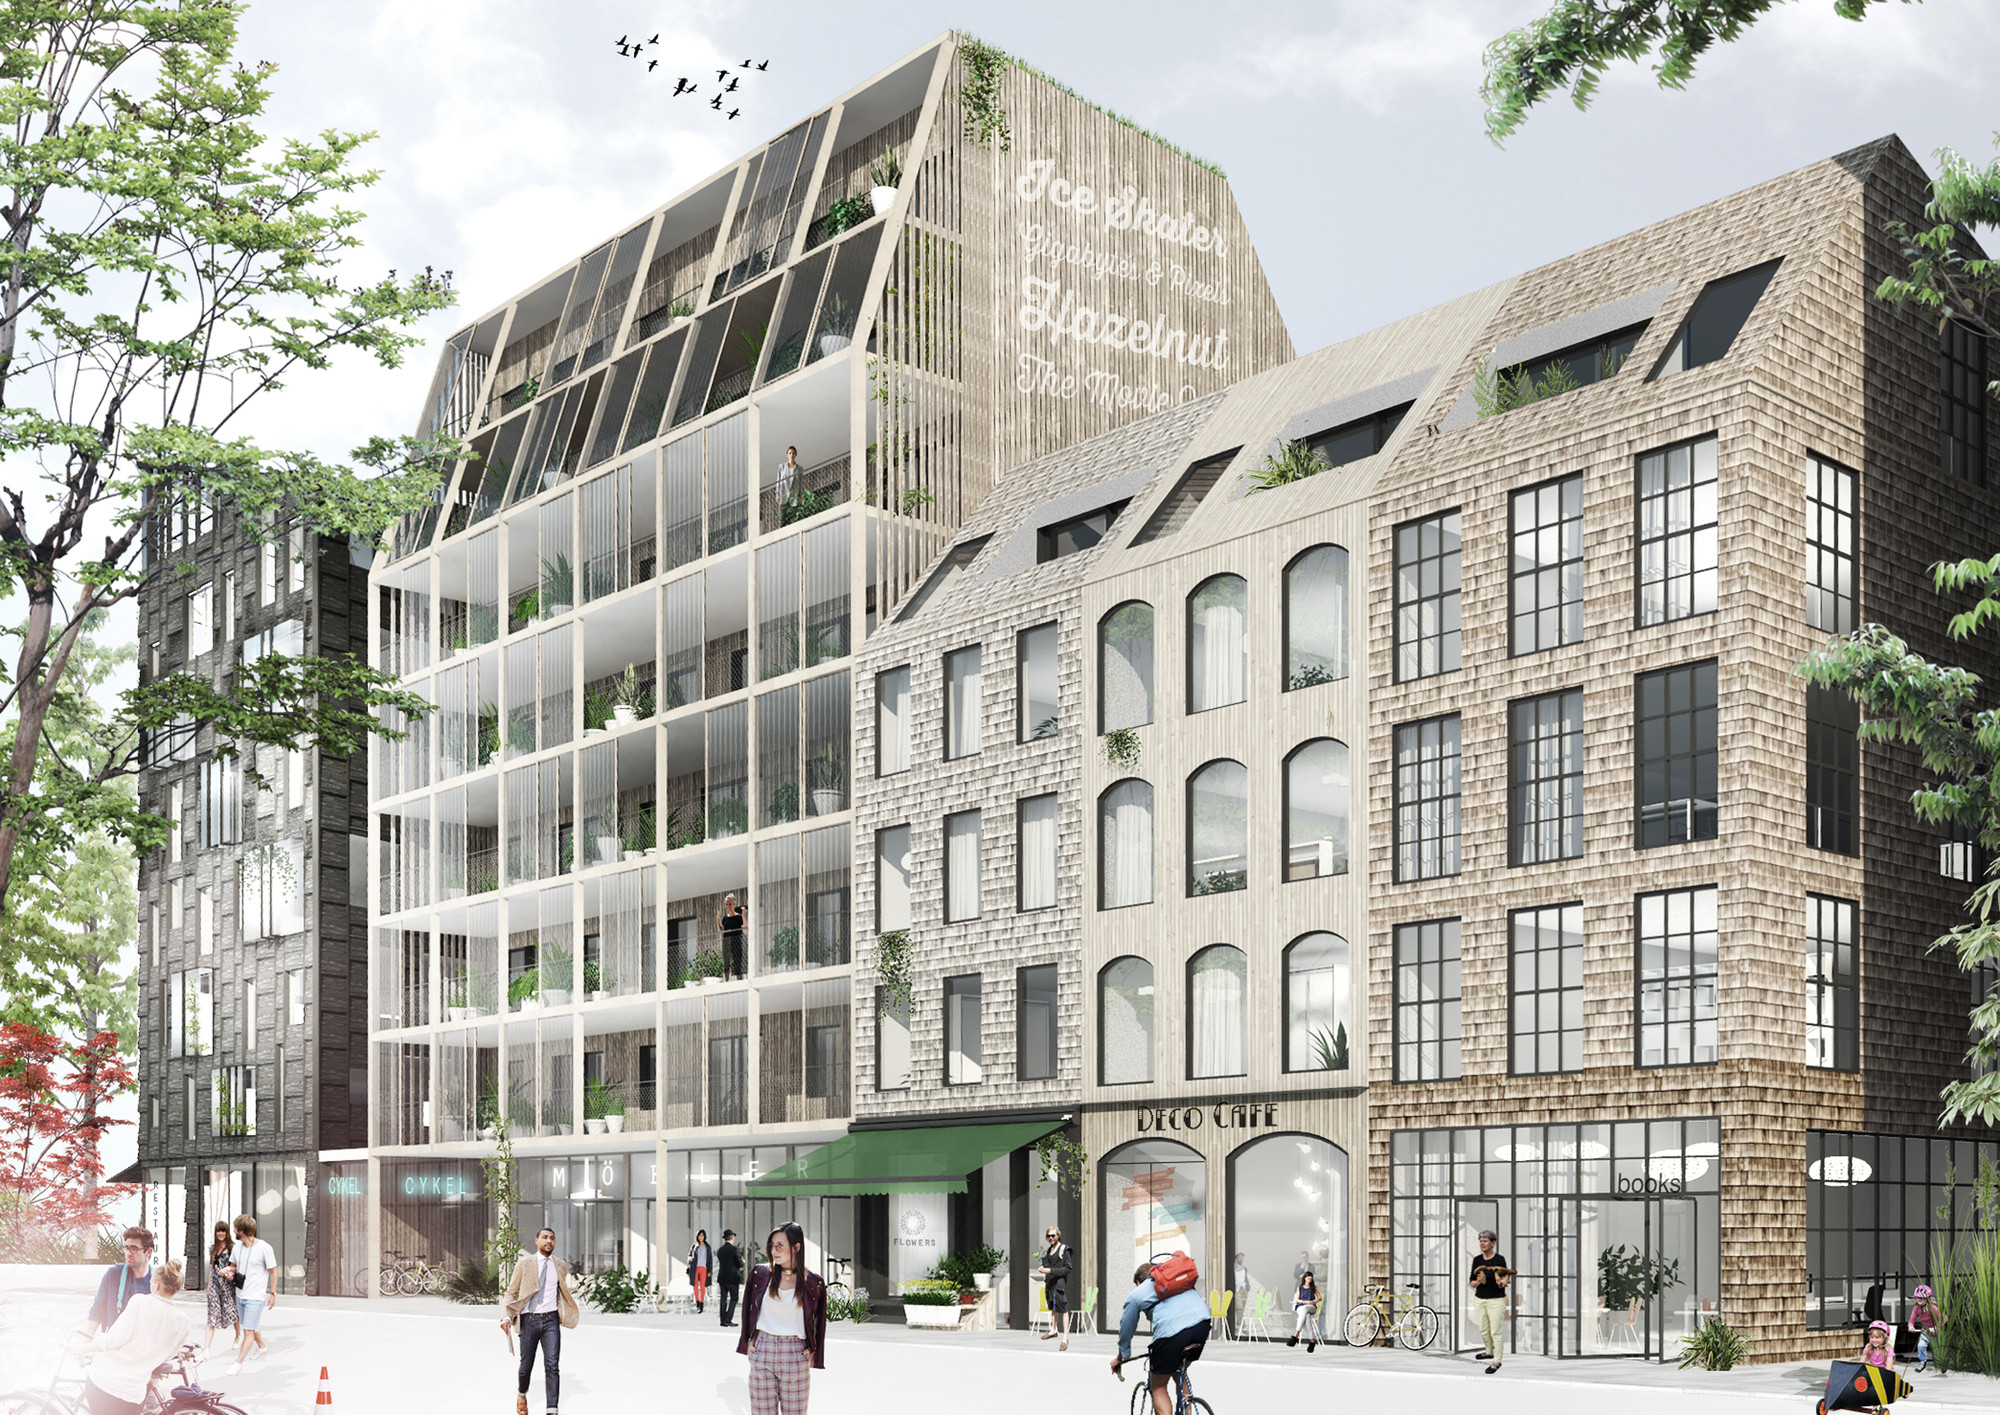 Kjellander + Sjöberg Take First Place with Rosendal Apartments, Street View of Exterior. Image Courtesy of Kjellander + Sjöberg